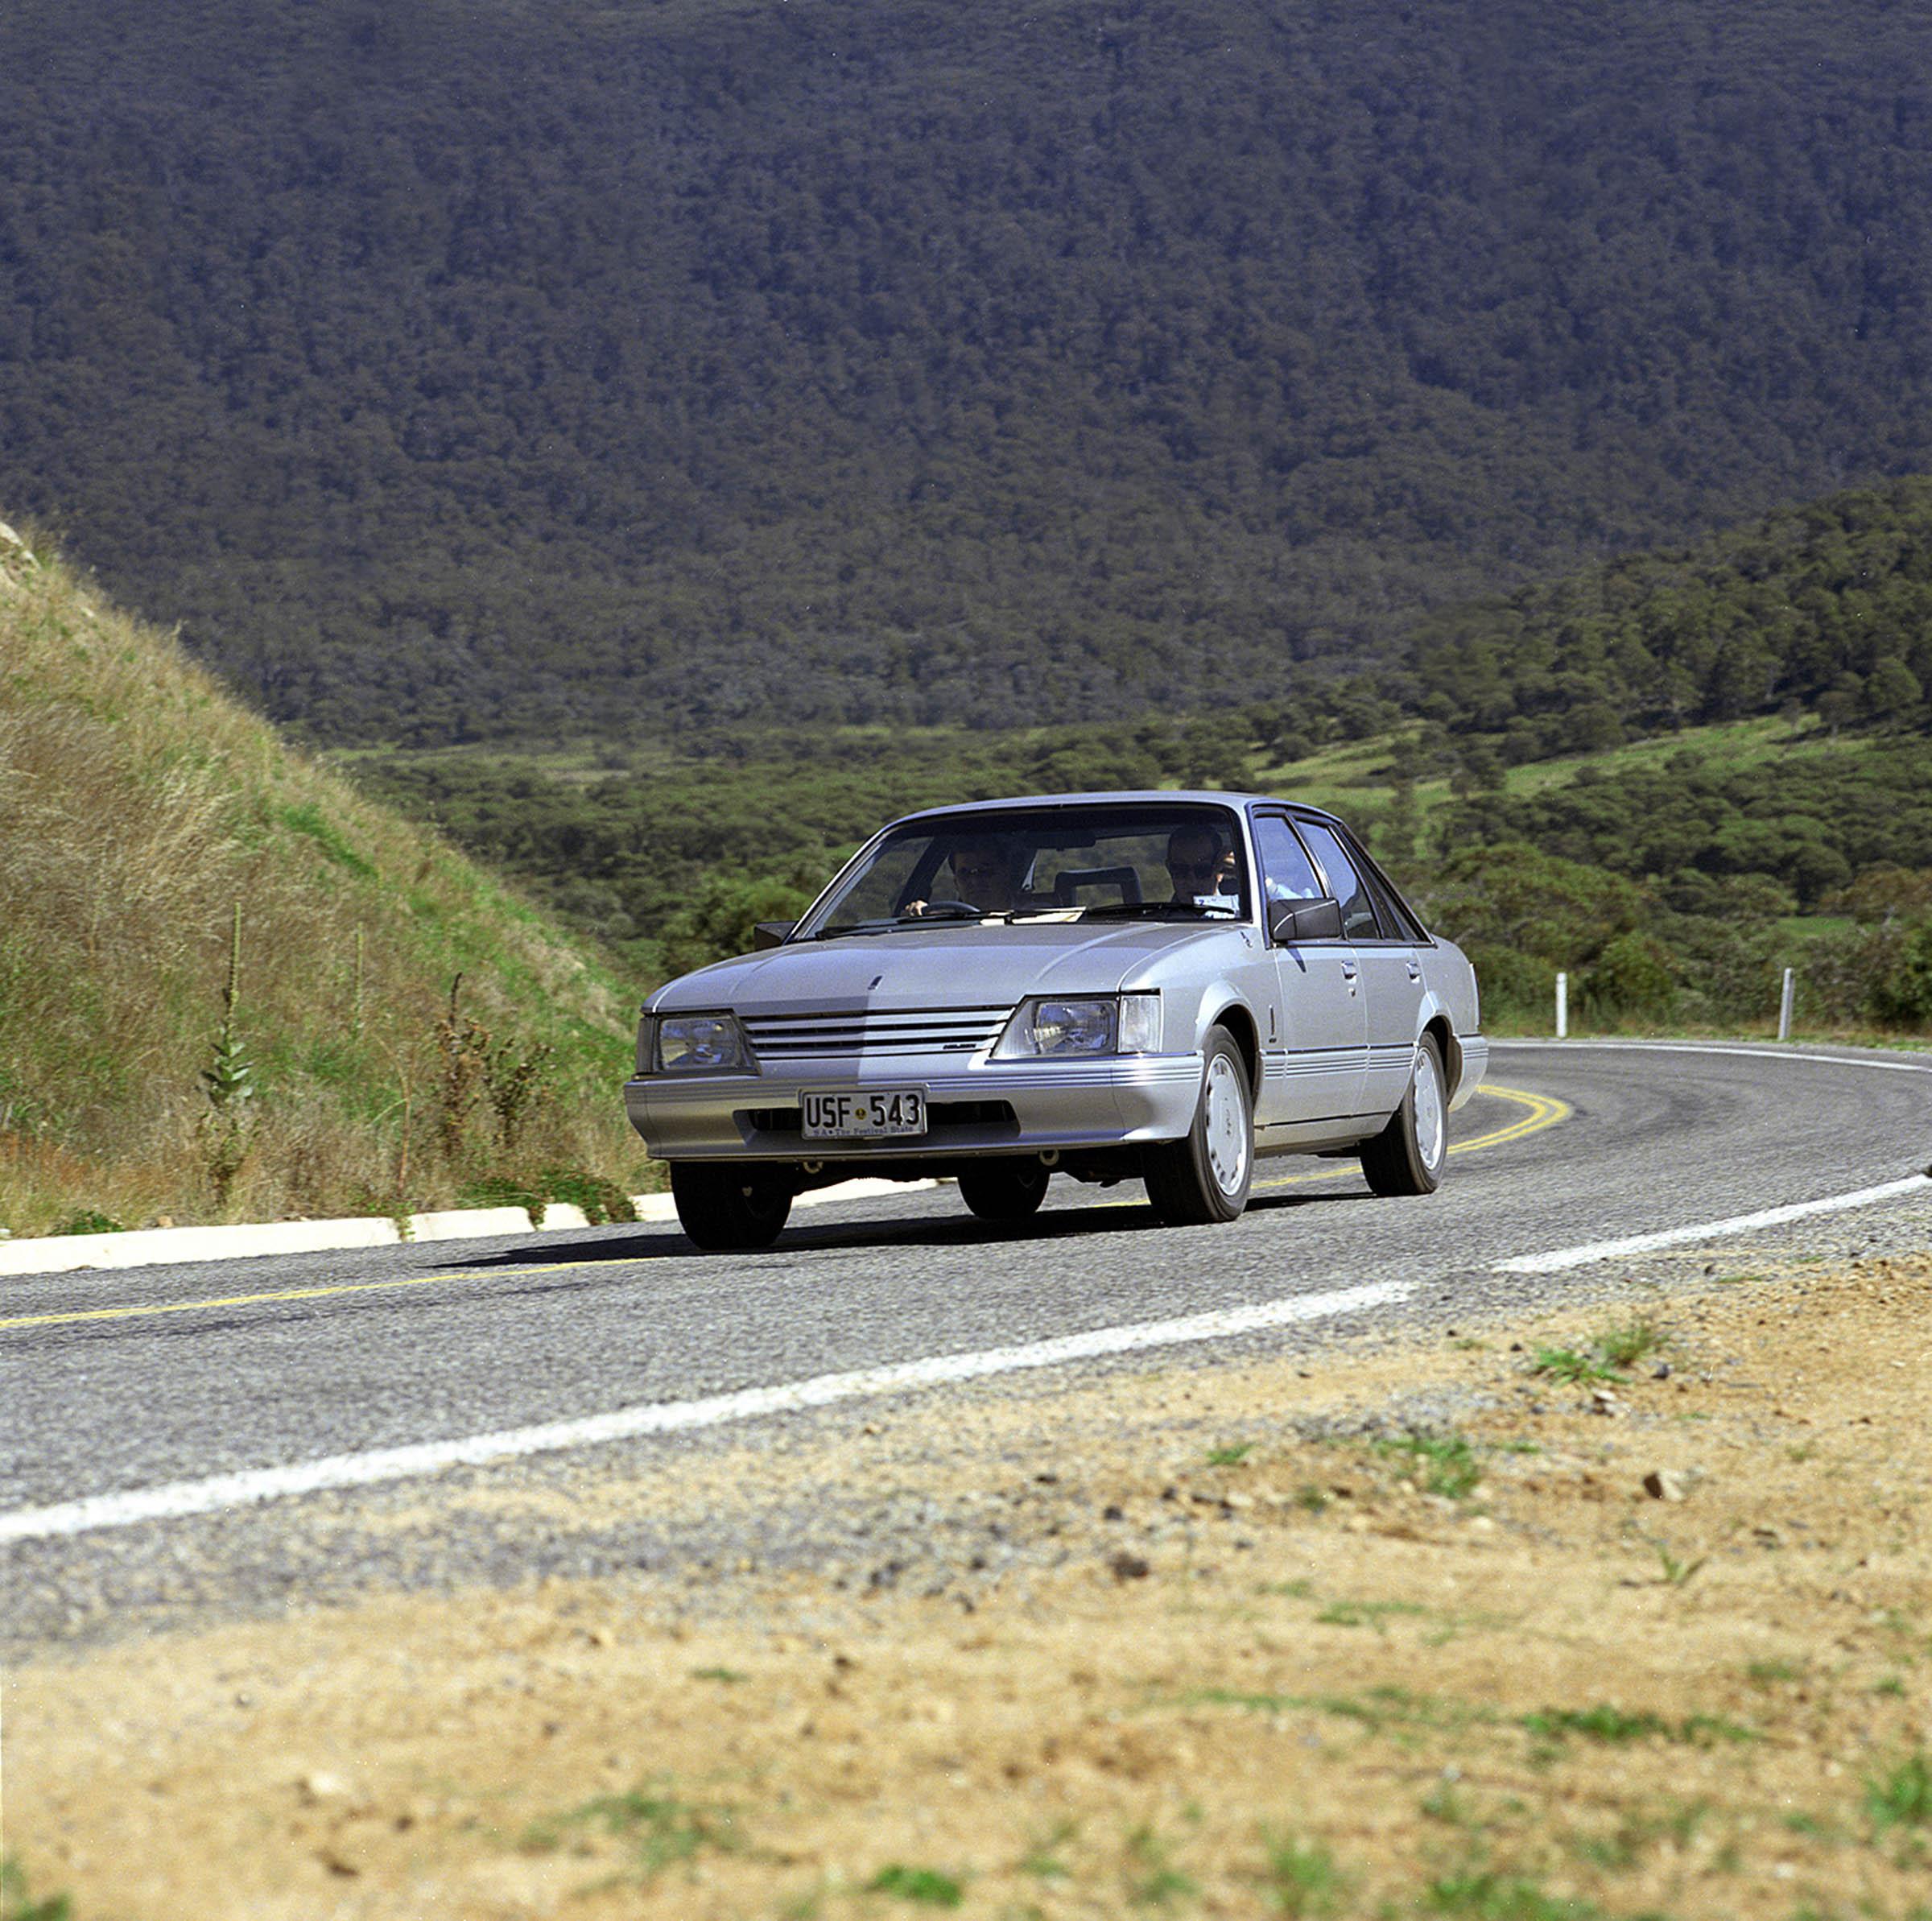 VK Holden Commodore (1984-1986)